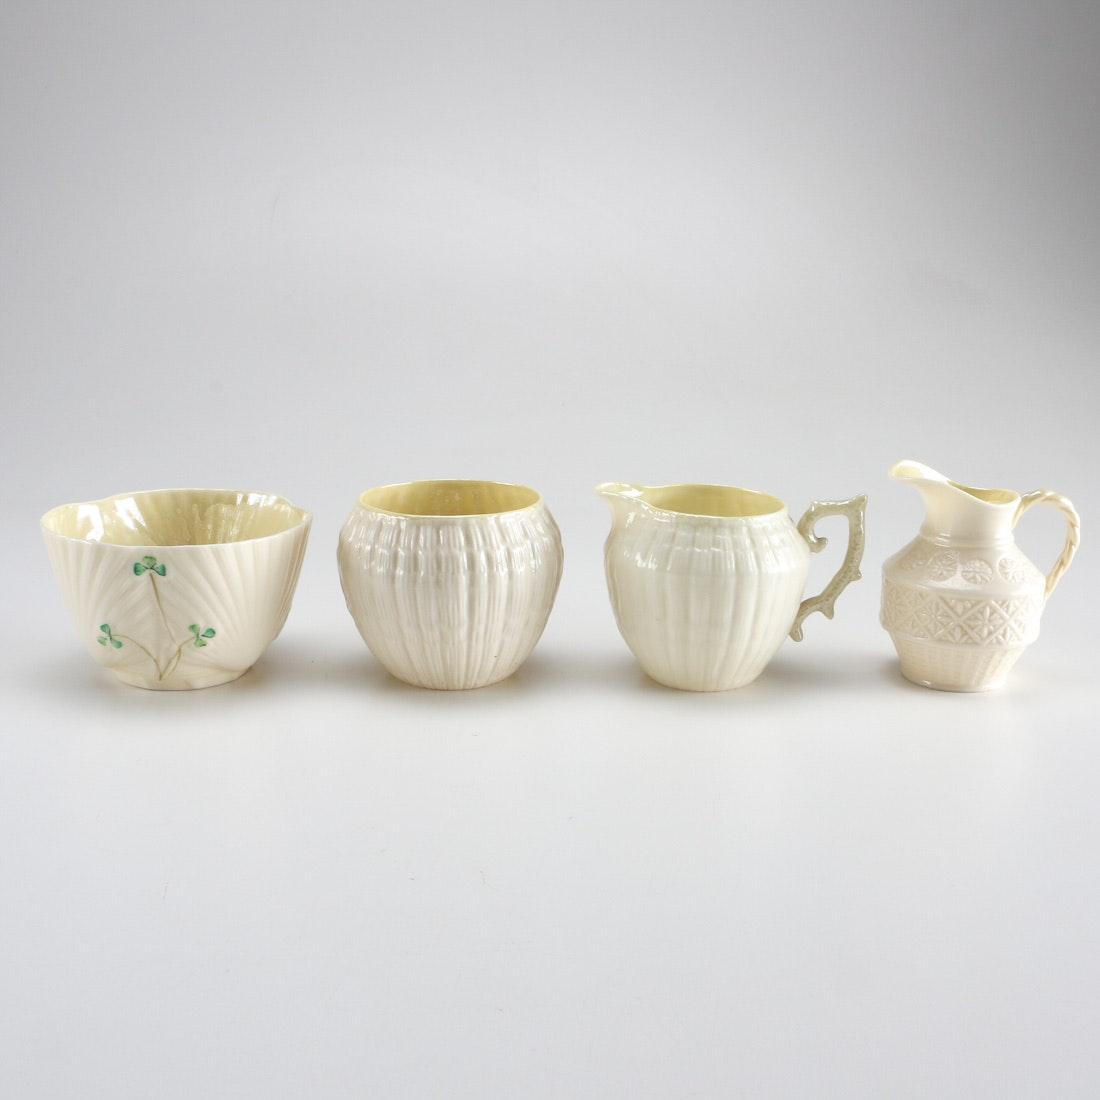 Collection of Baleek Servingware